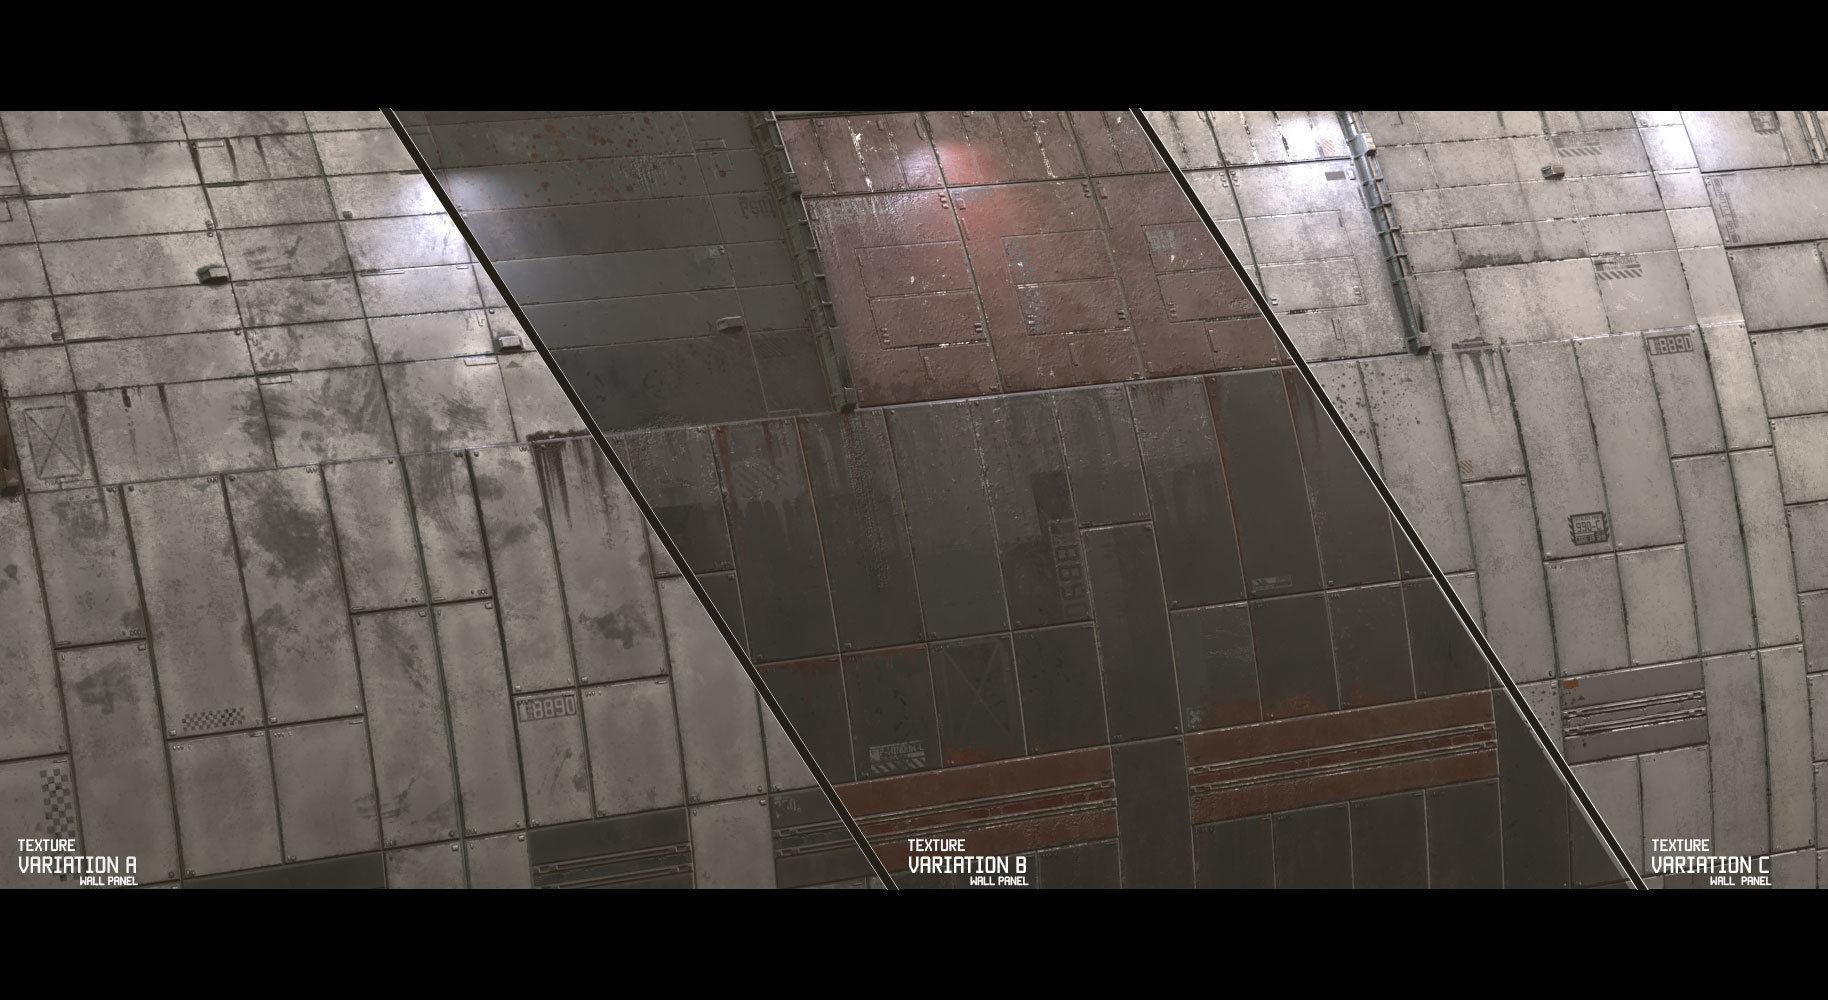 sci fi wall texture. Contemporary Wall Scifi Wall Panel Texture Set D 3d Model  To Sci Fi Wall Texture